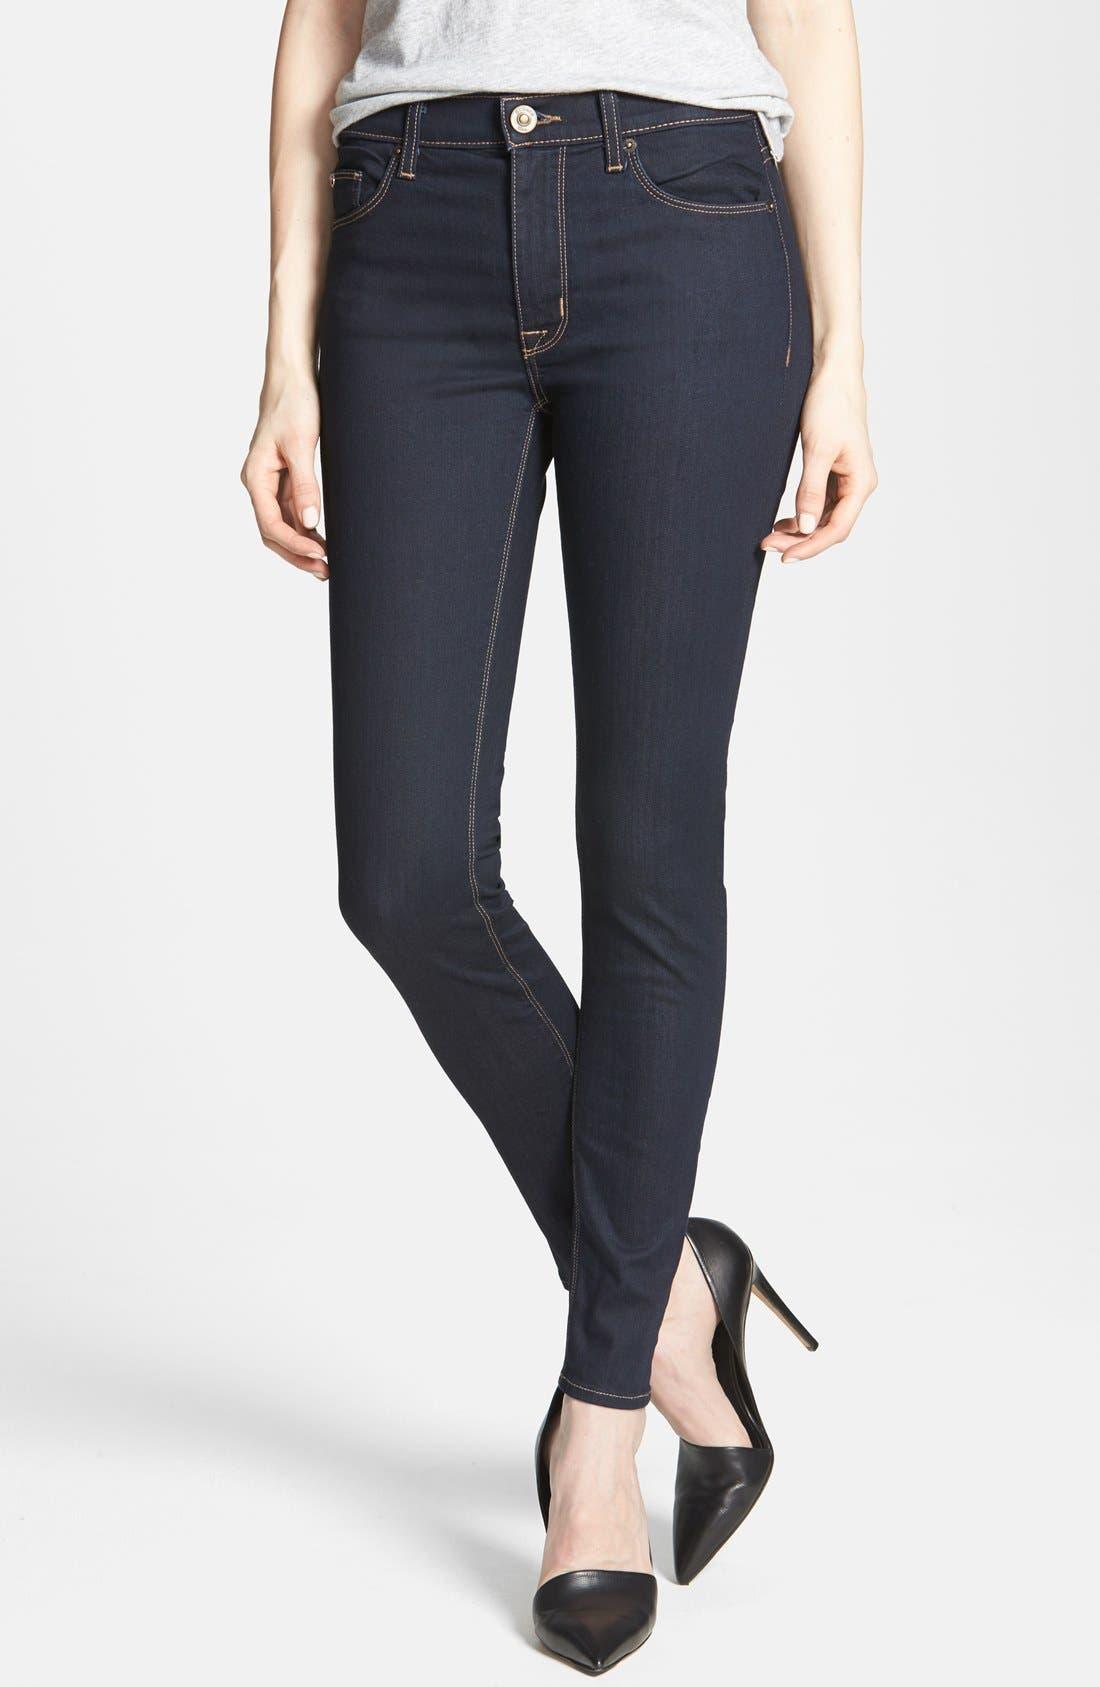 Alternate Image 1 Selected - Hudson Jeans 'Barbara' High Rise Skinny Jeans (Storm)